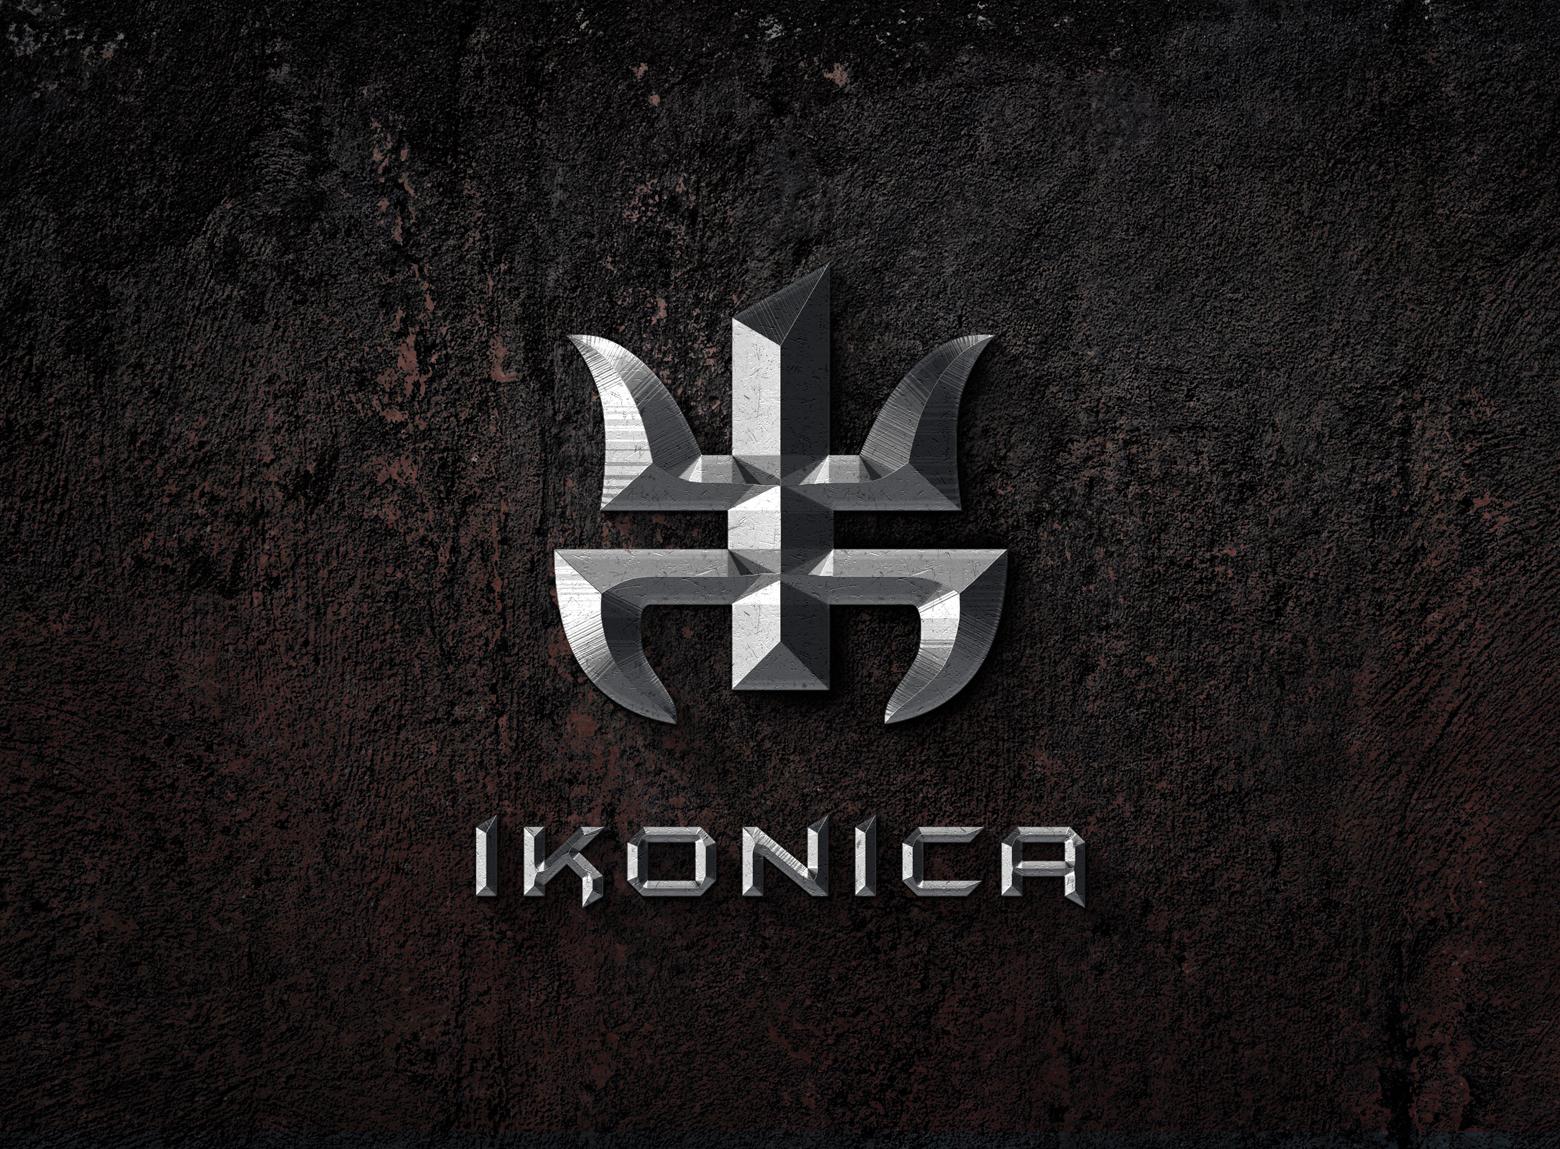 logotipo Ikonica por Switch Studio